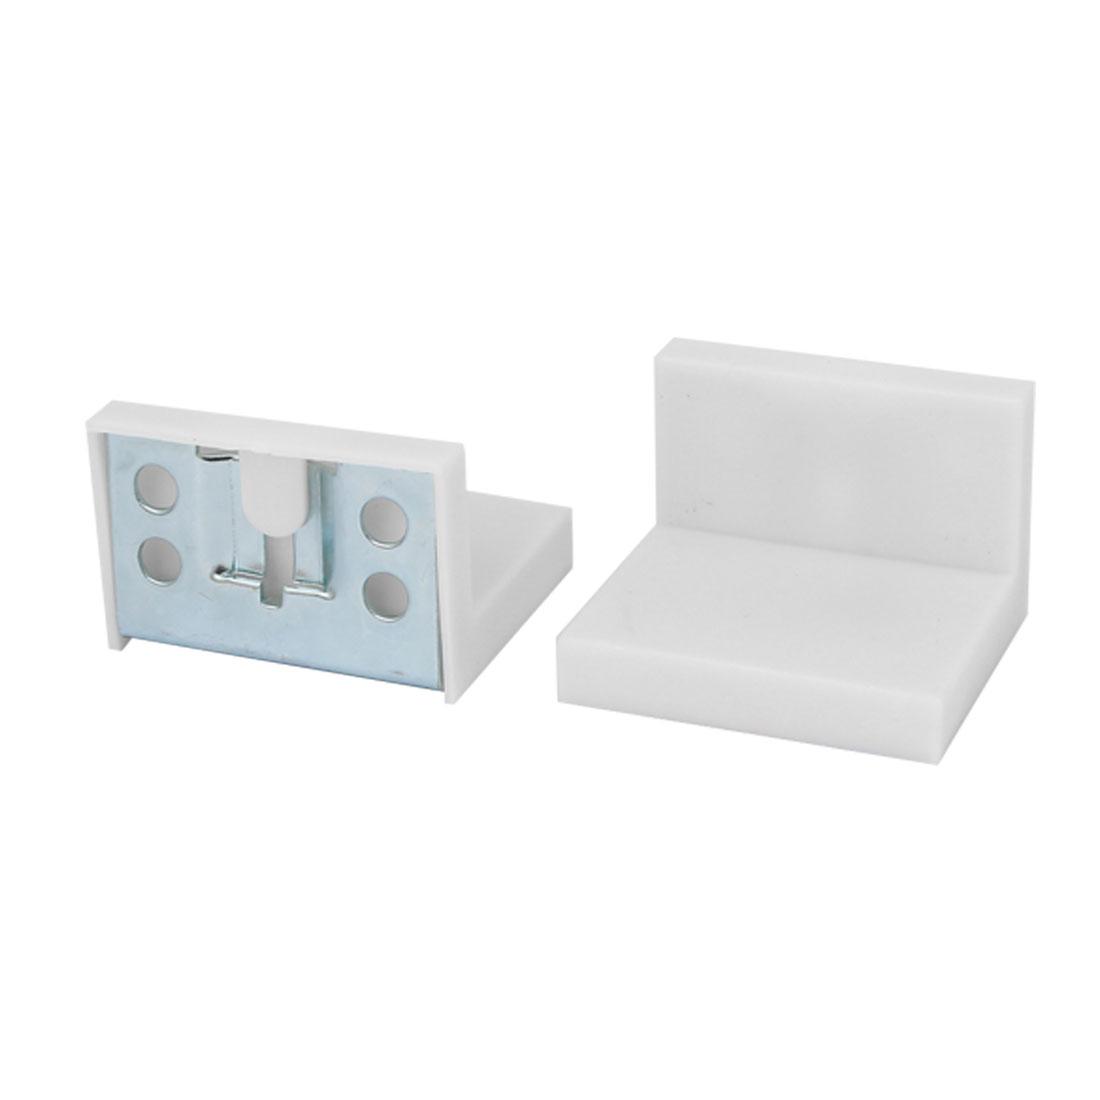 Cupboard Cabinet Wardrobe Iron Corner Brace Right Angle Bracket 50mmx45mm 2pcs